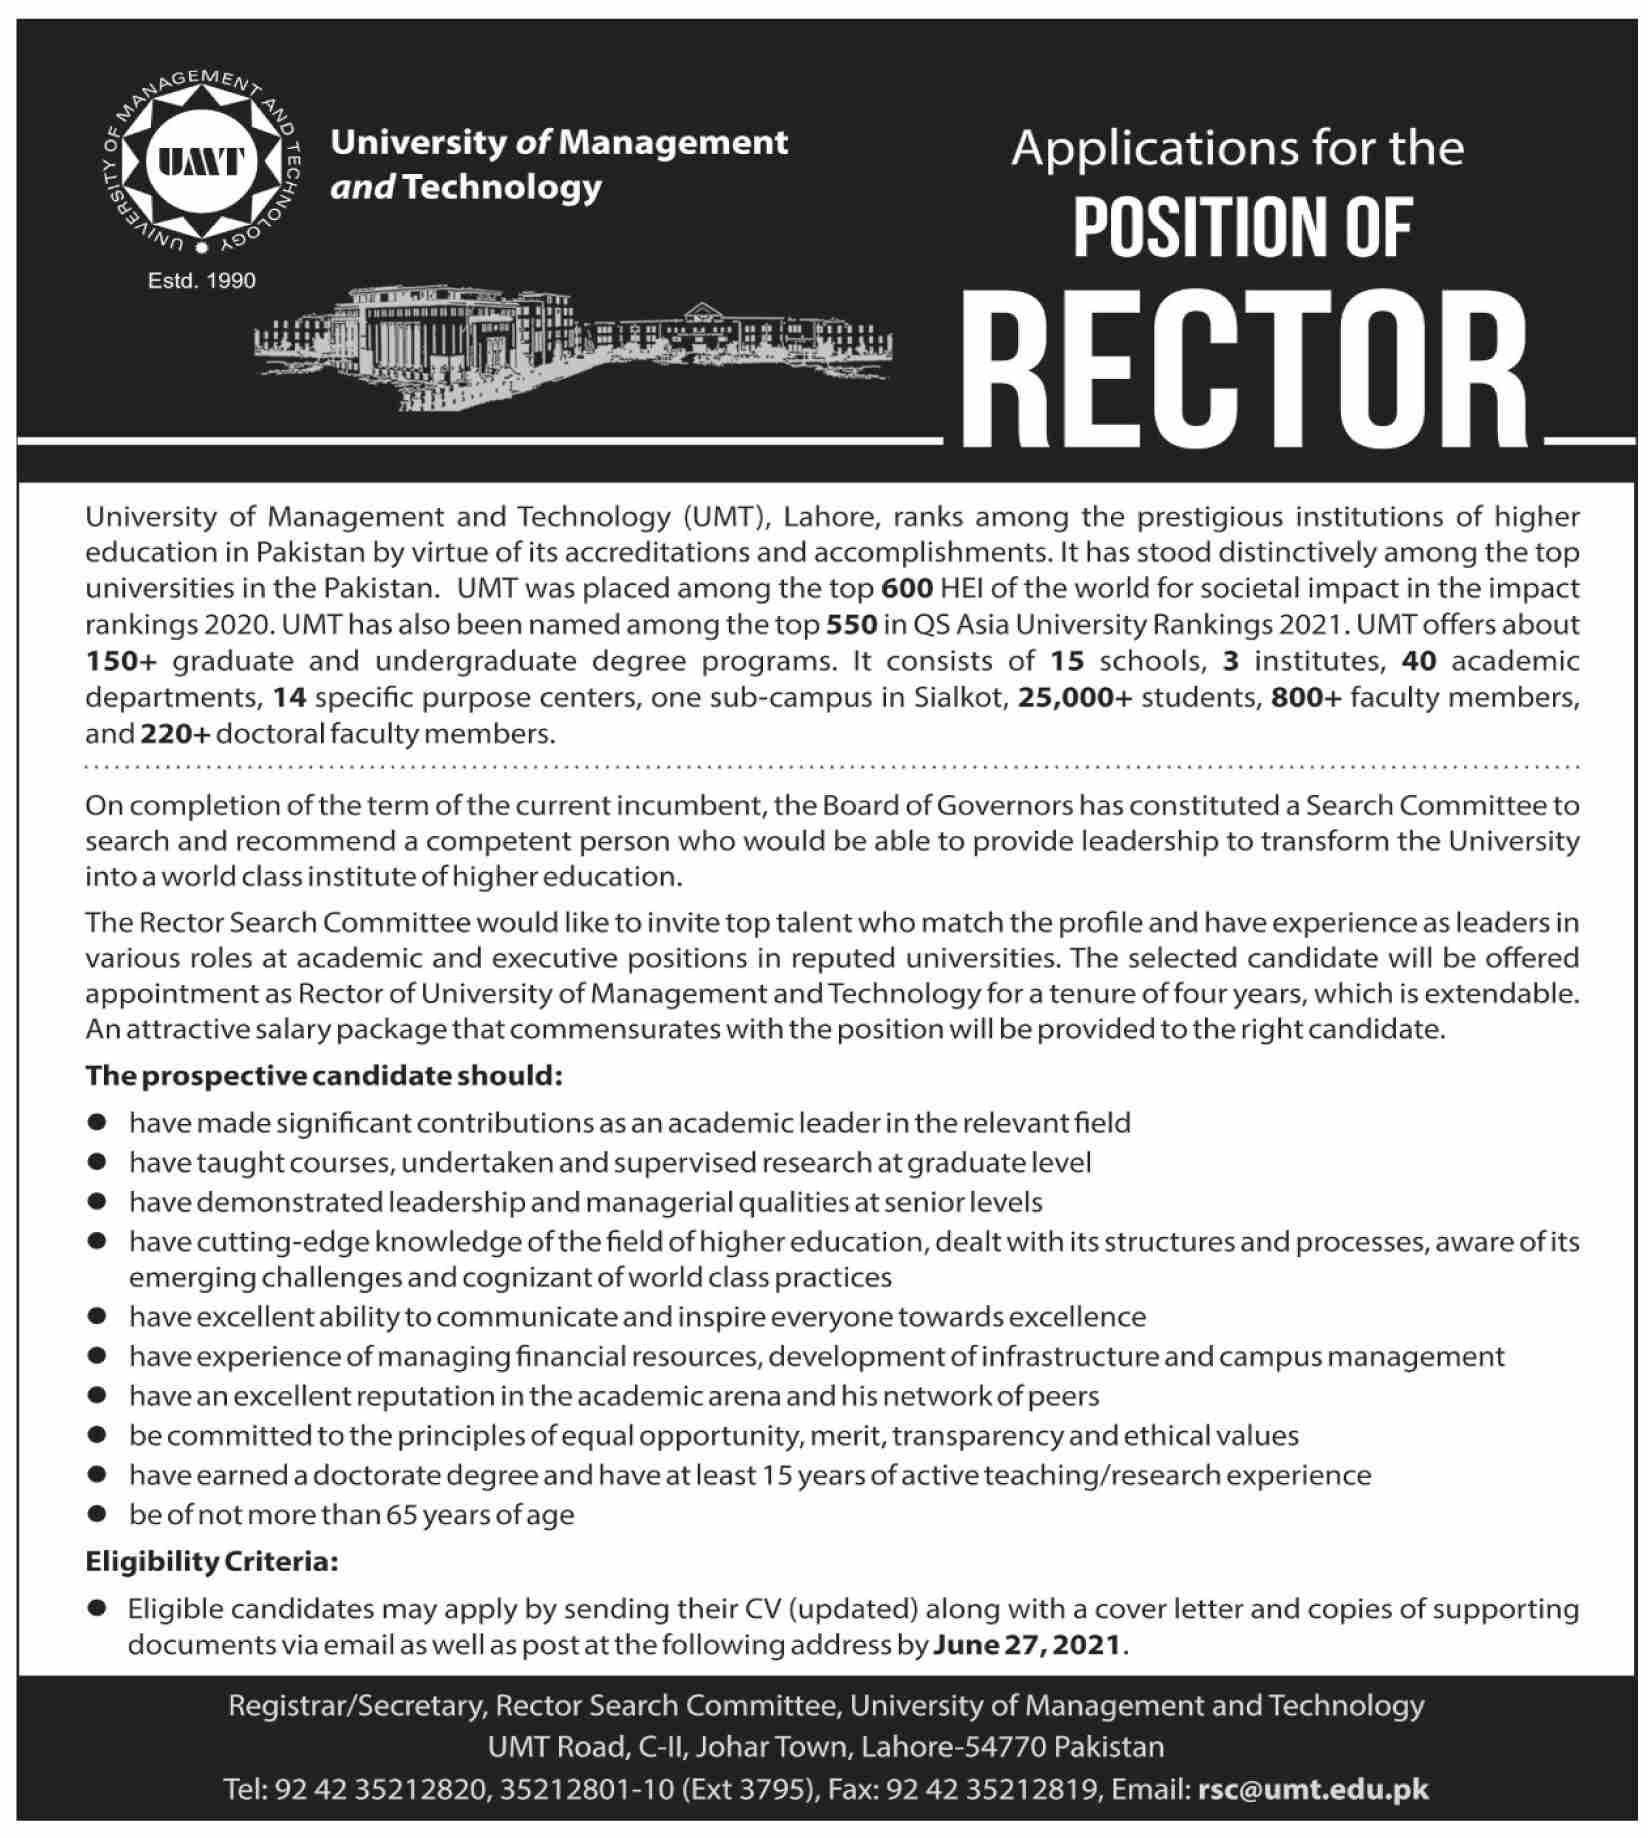 rsc@umt.edu.pk - University Of Management And Technology (UMT) Jobs 2021 in Pakistan